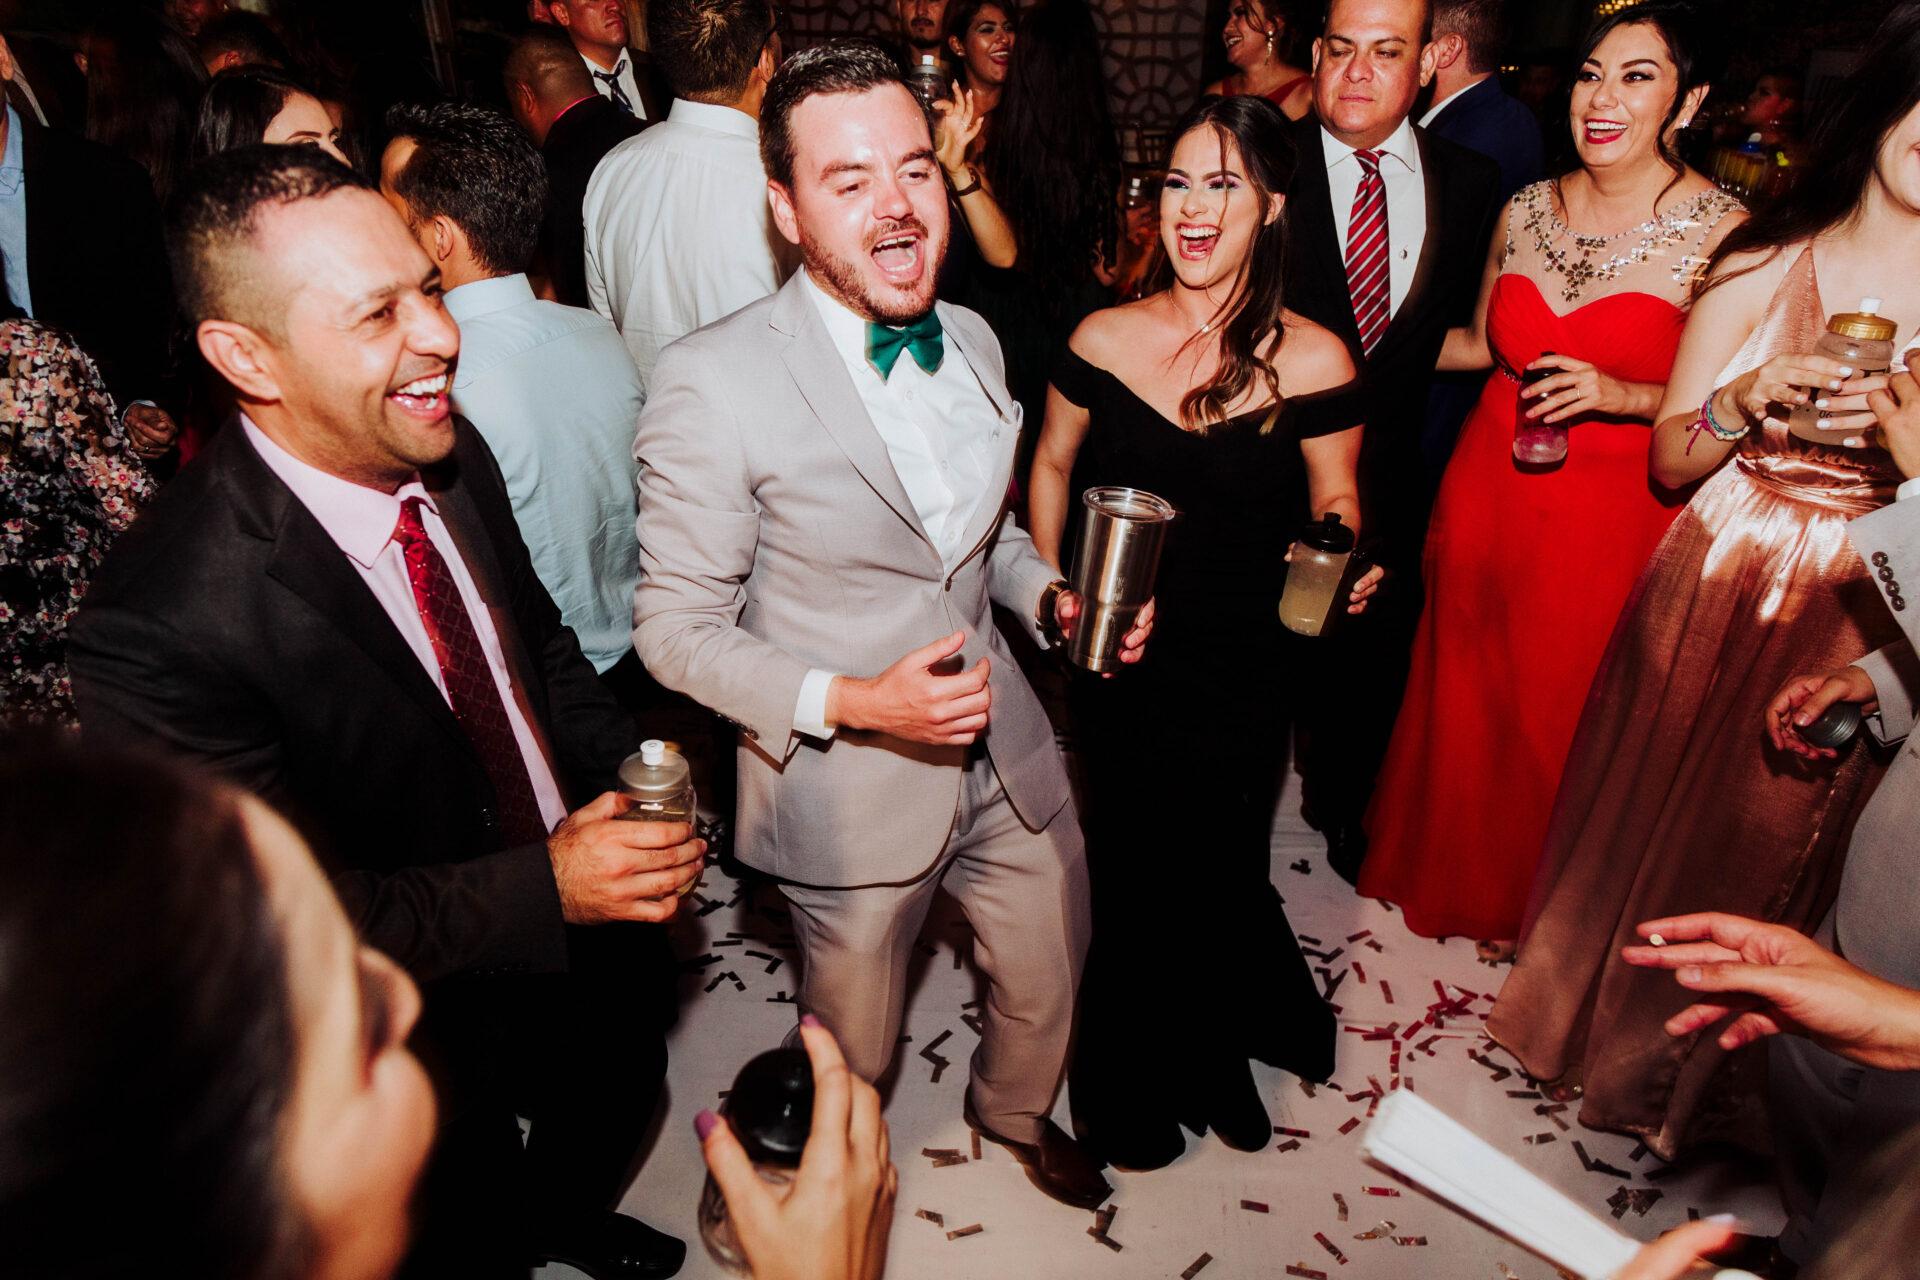 javier_noriega_fotografo_bodas_torreon_coahuila_zacatecas_wedding_photographer61a